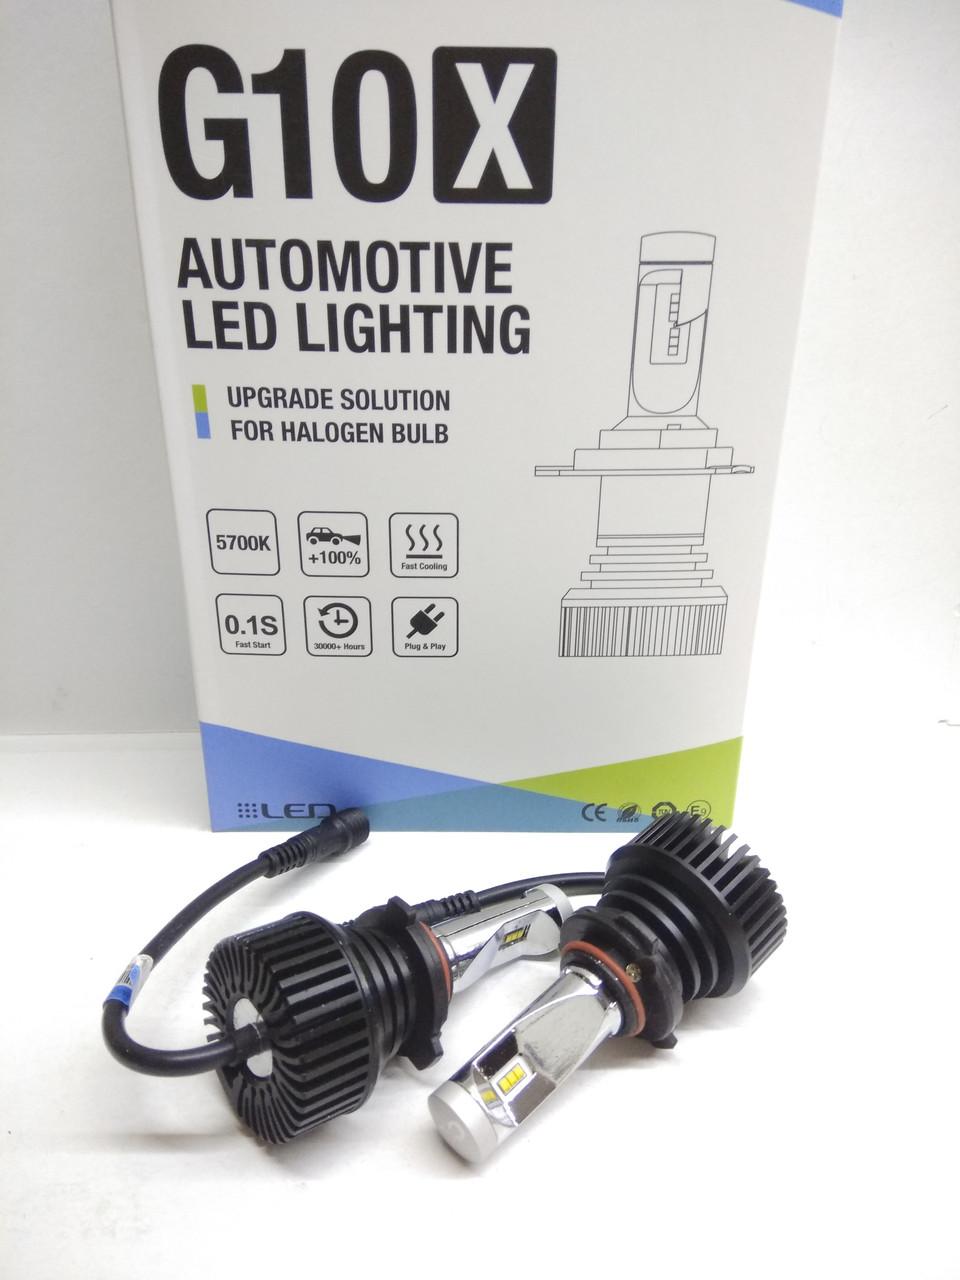 Aвтолампы LED G10X (CL5), HB3/HB4 (9005/9006), 5000K(теплый белый), 30W, Lumileds Luxeon Z ES